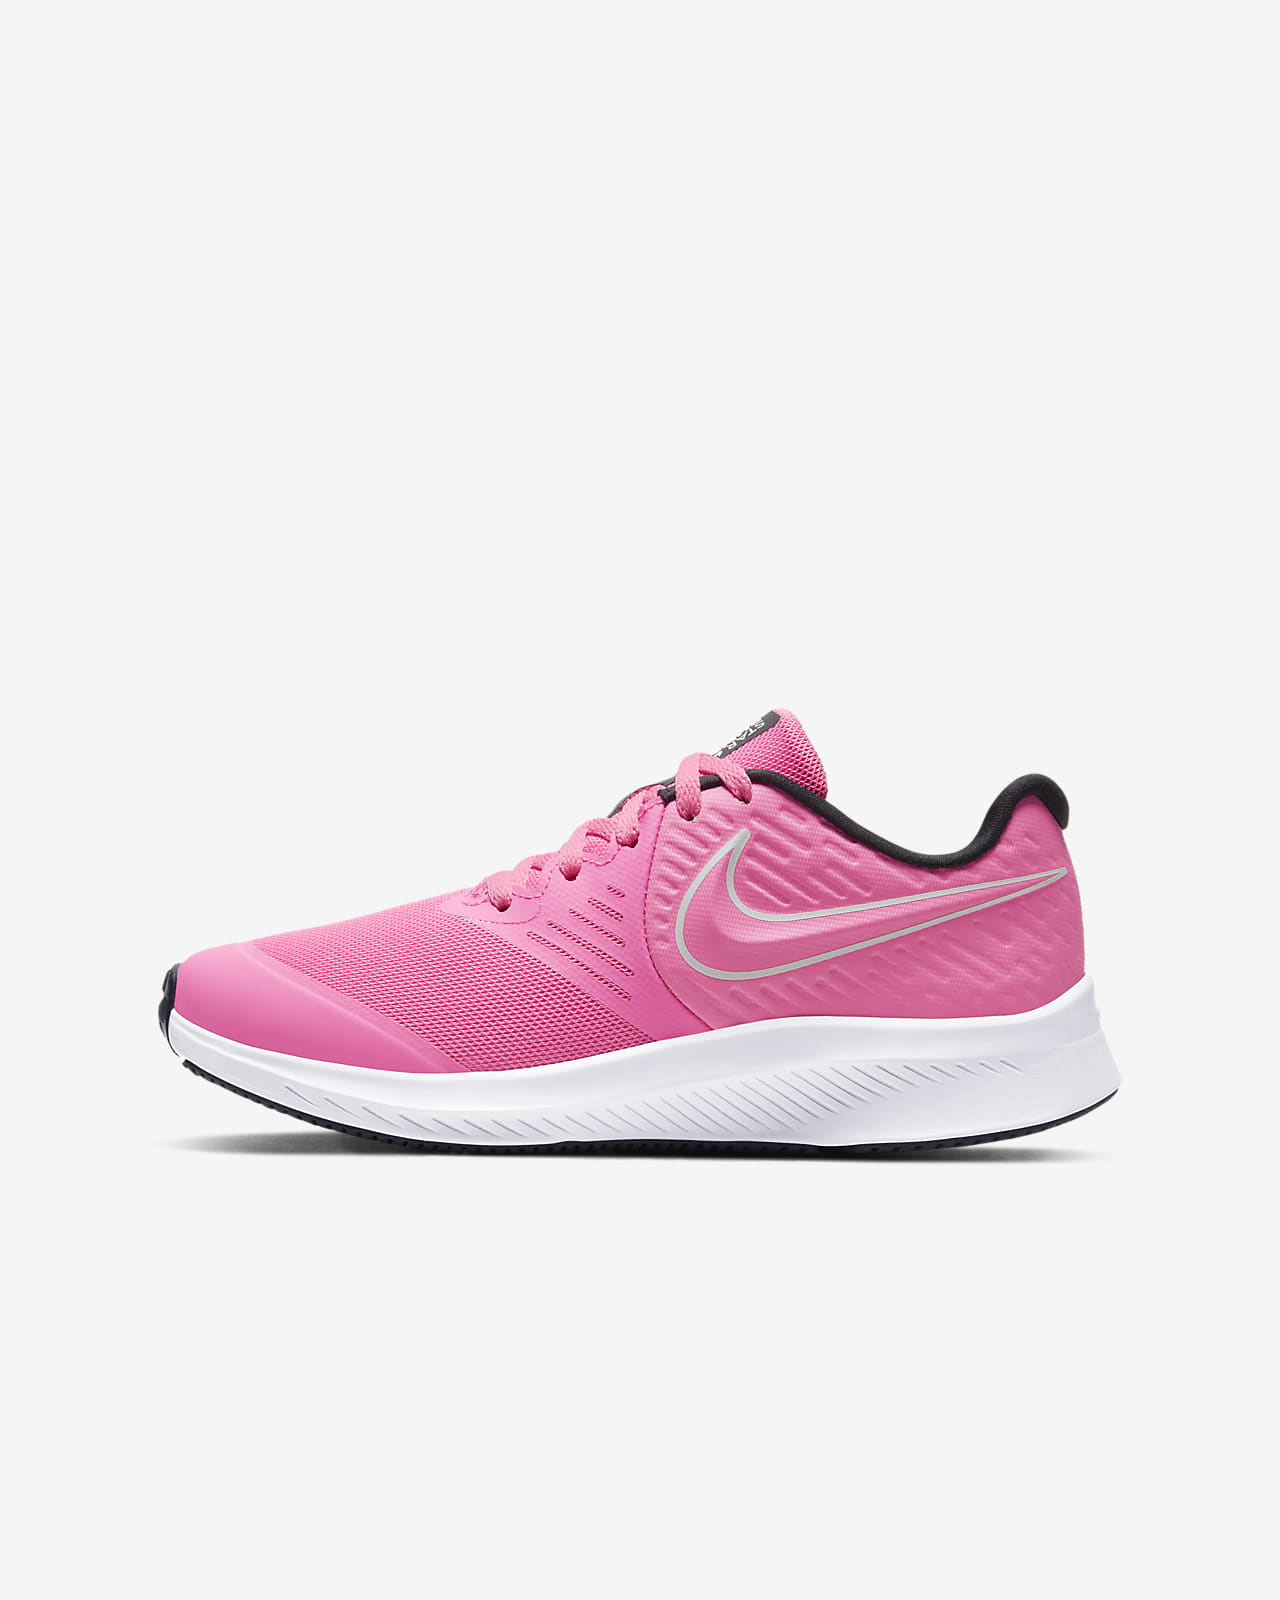 Nike Star Runner 2 Big Kids' Running Shoe, New normal